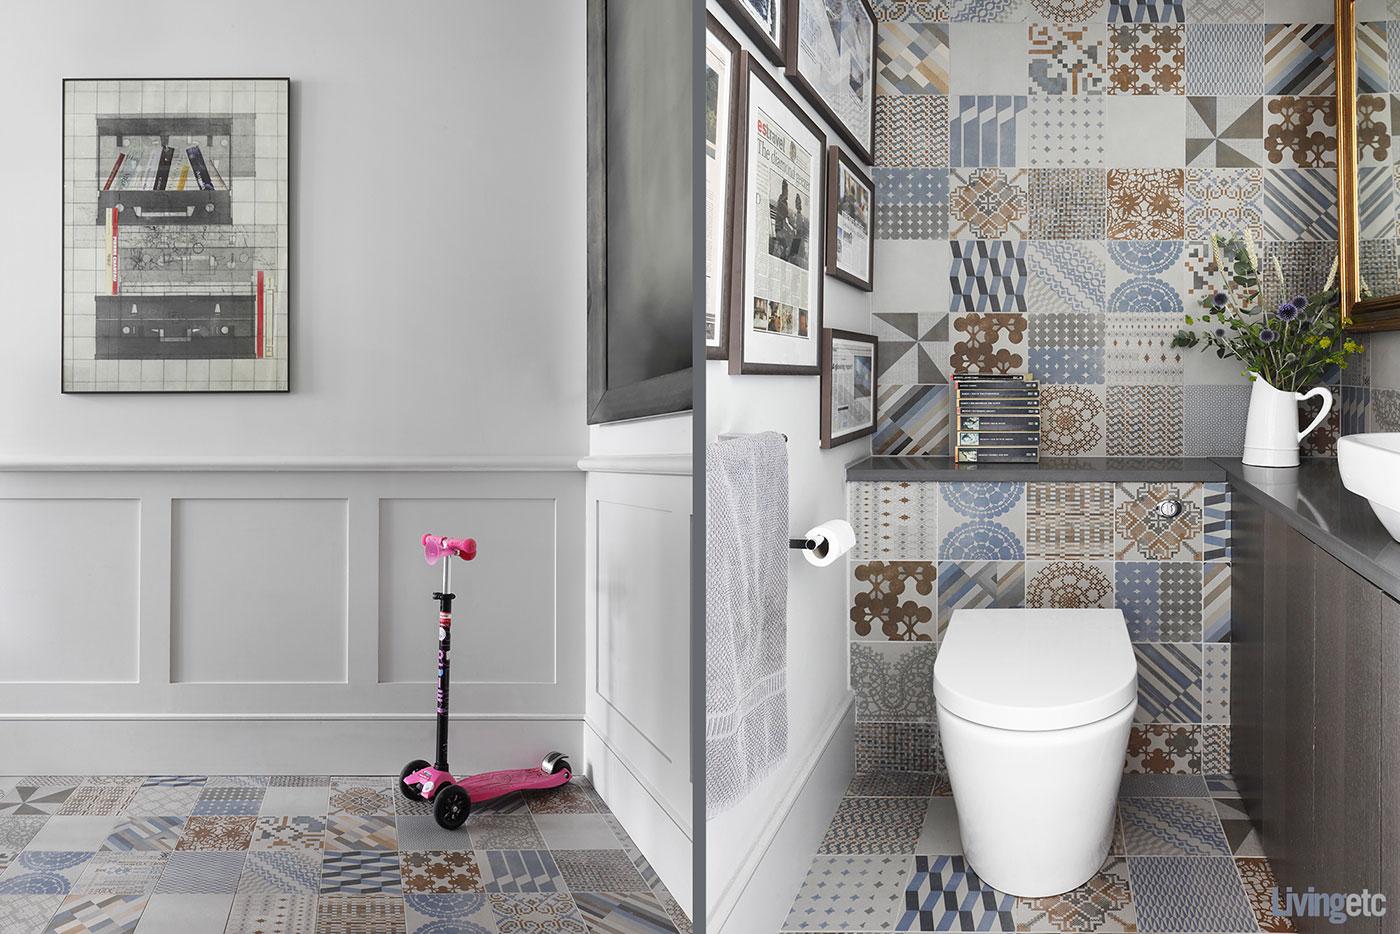 Eclectic tiles